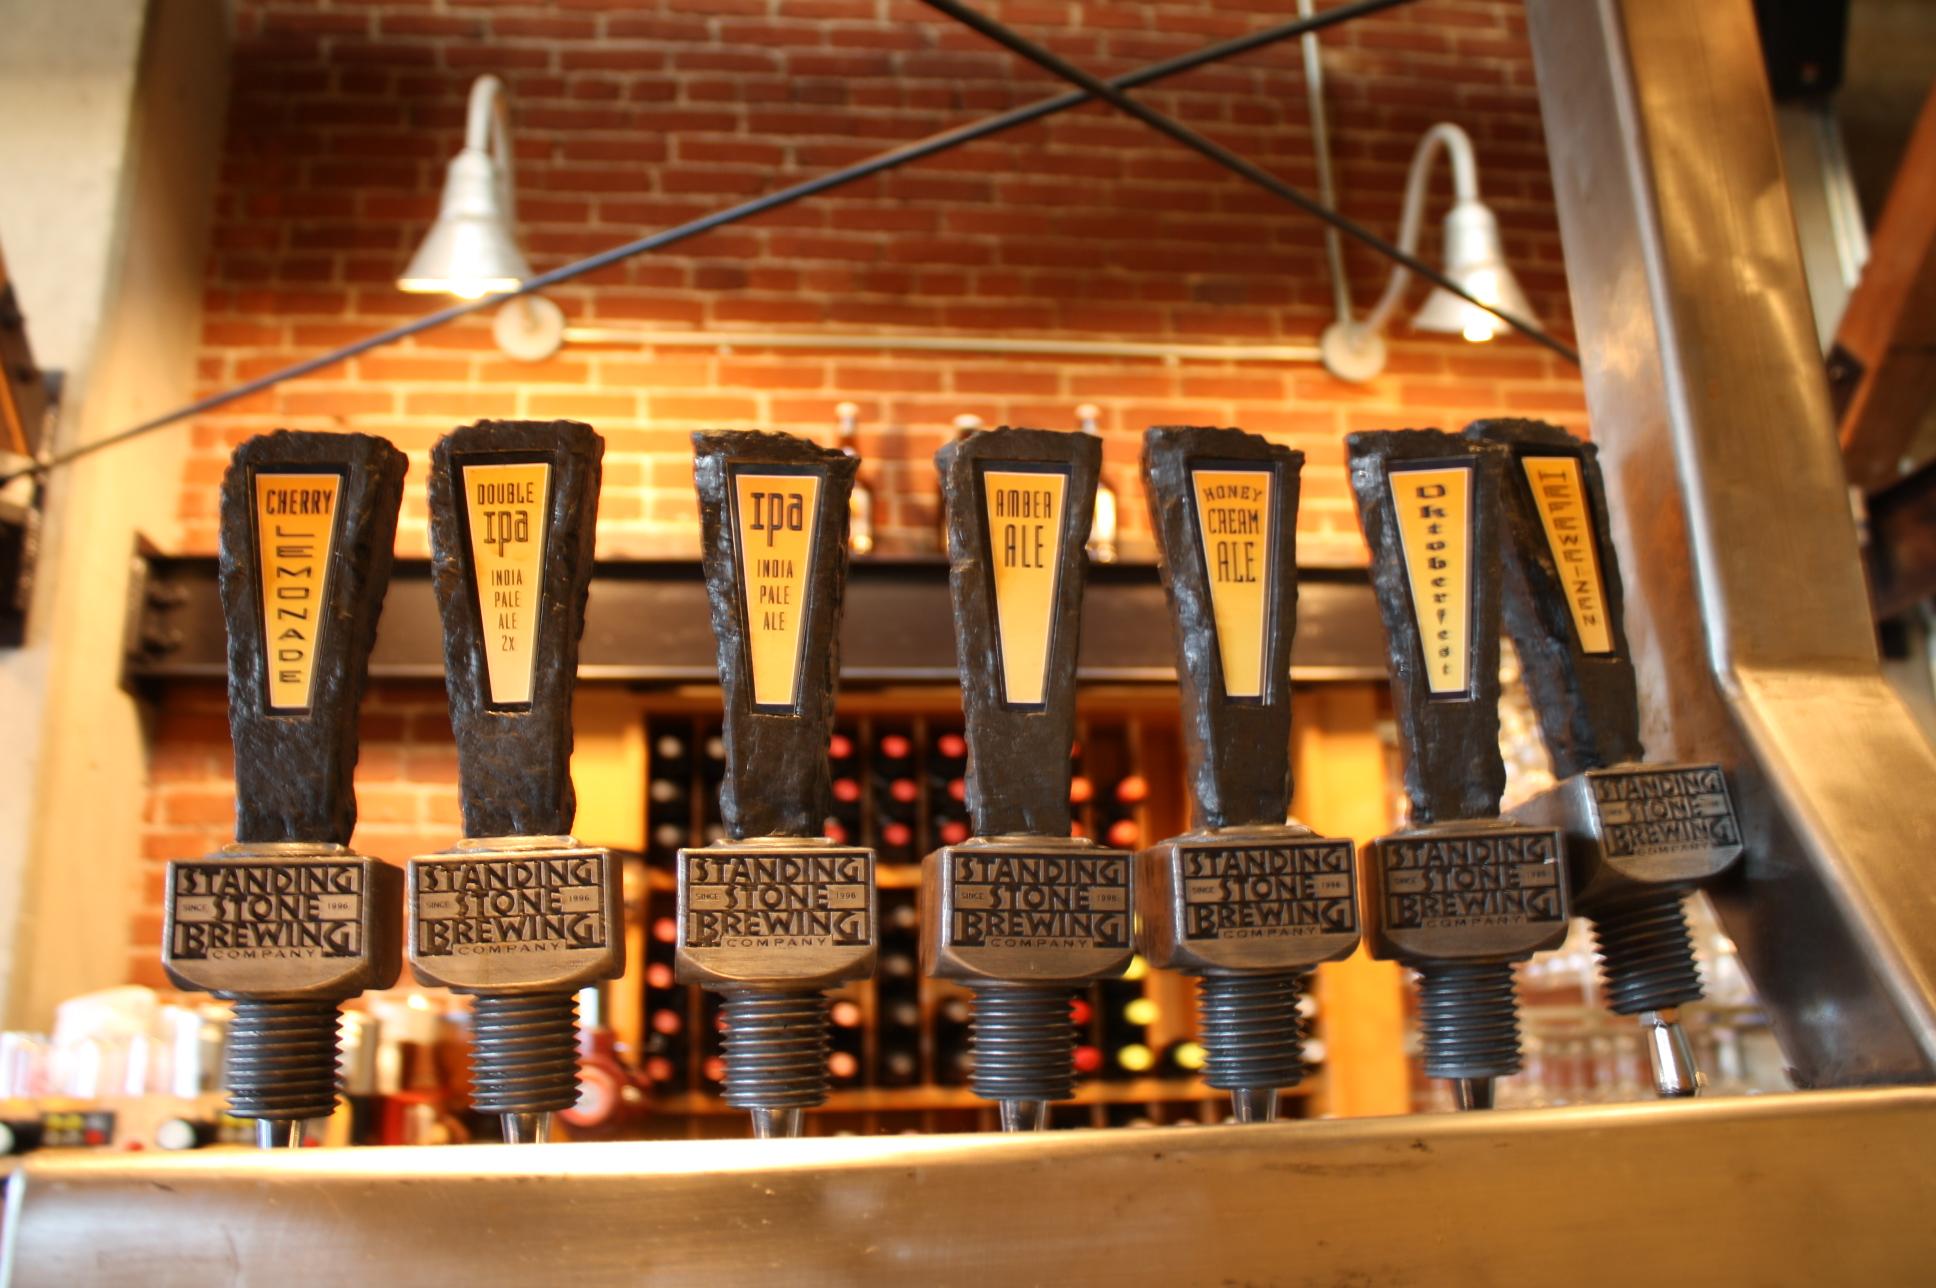 Standing Stone tap handles